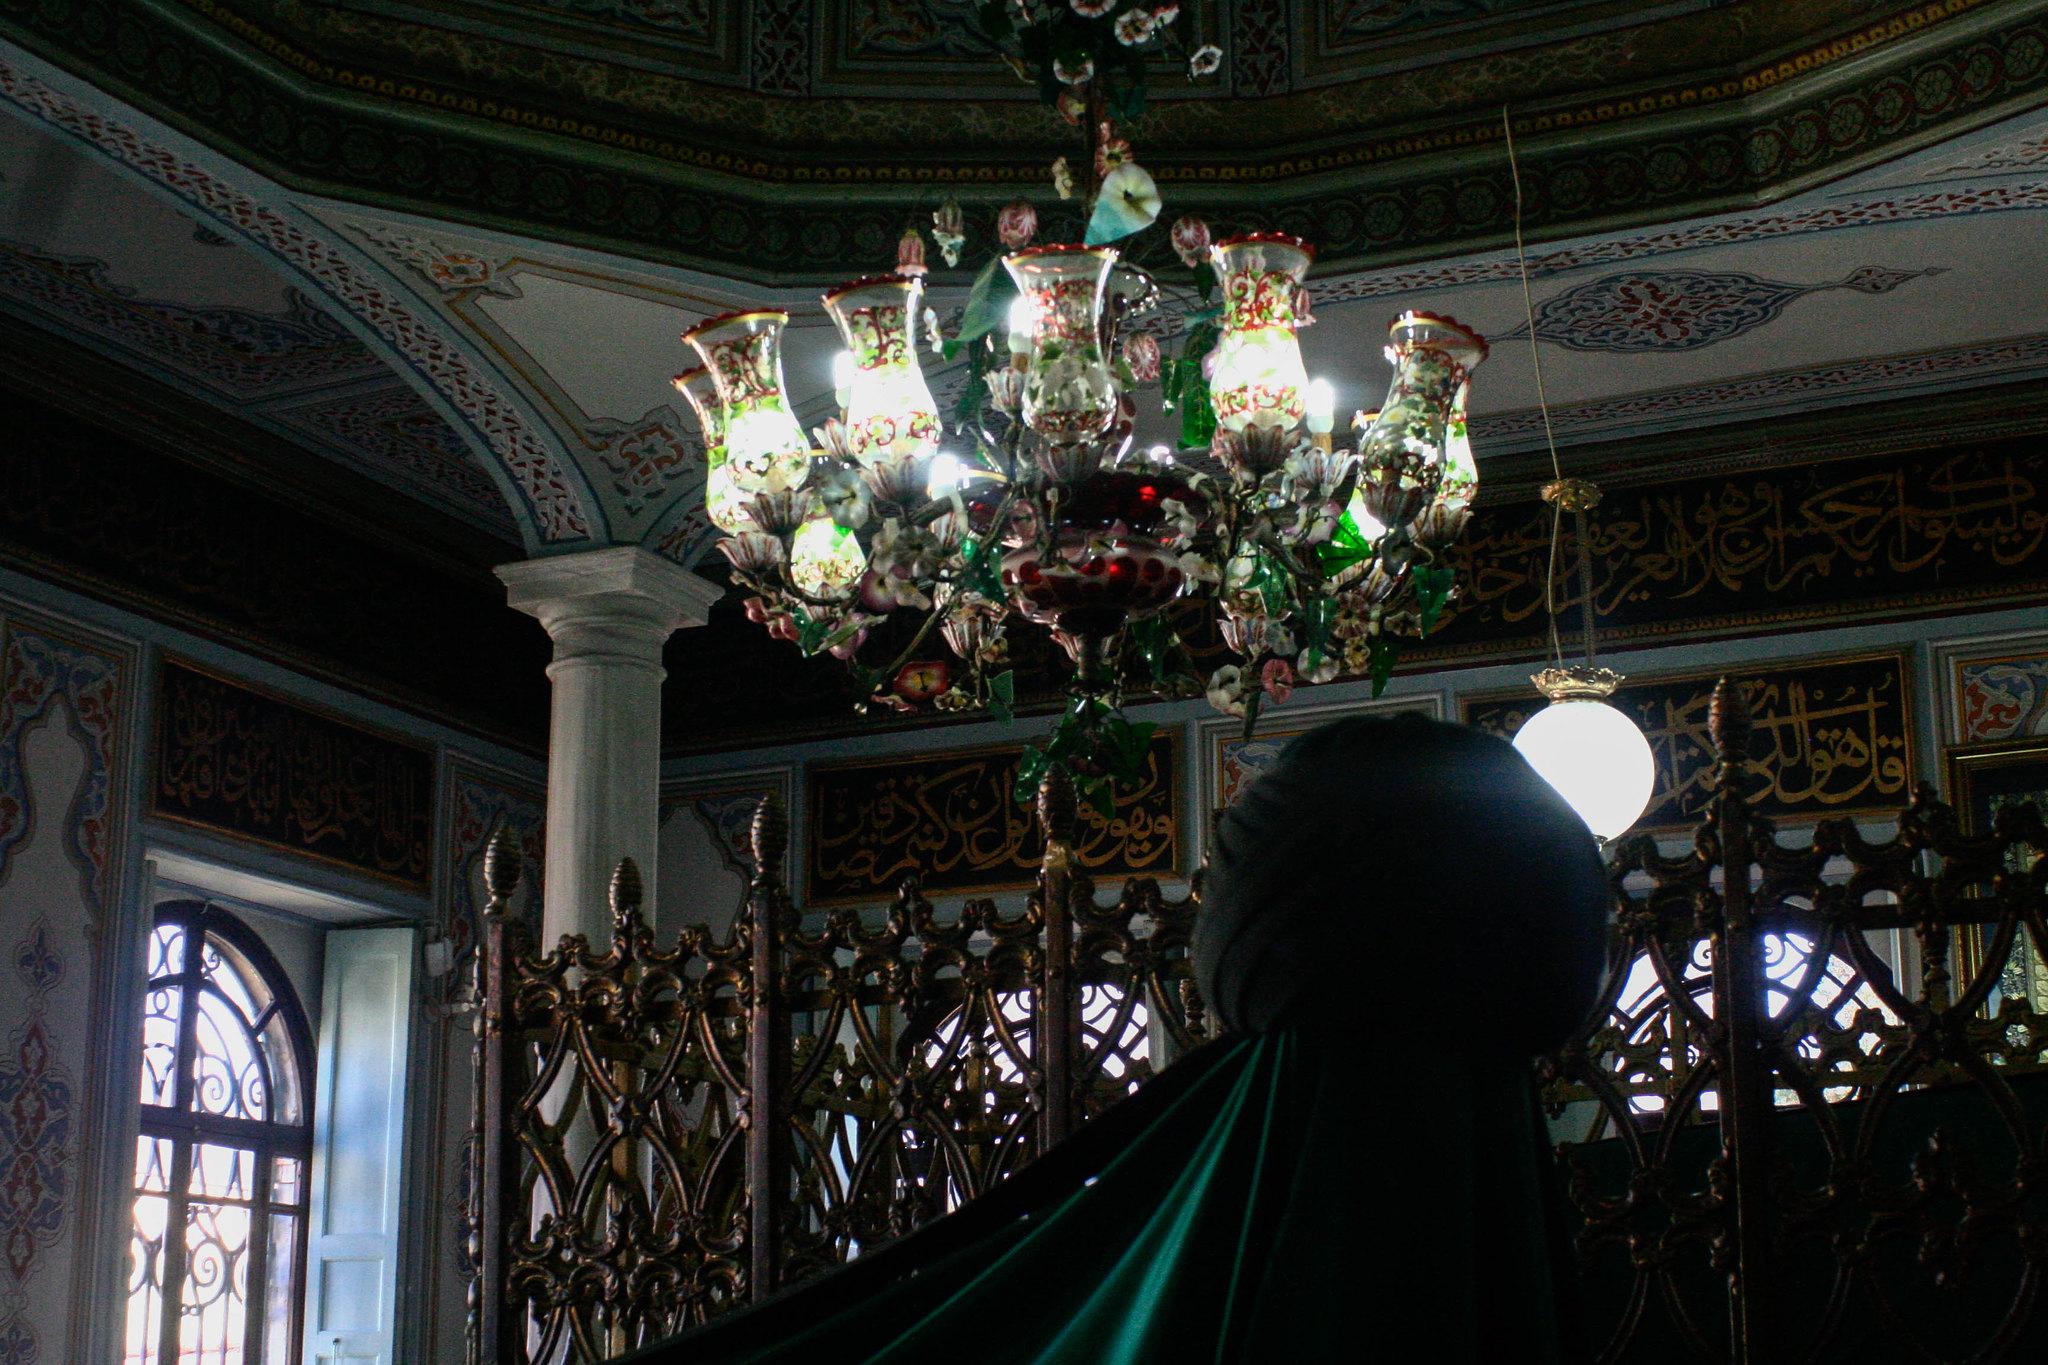 The Tomb of Aziz Mahmud Hüdayı